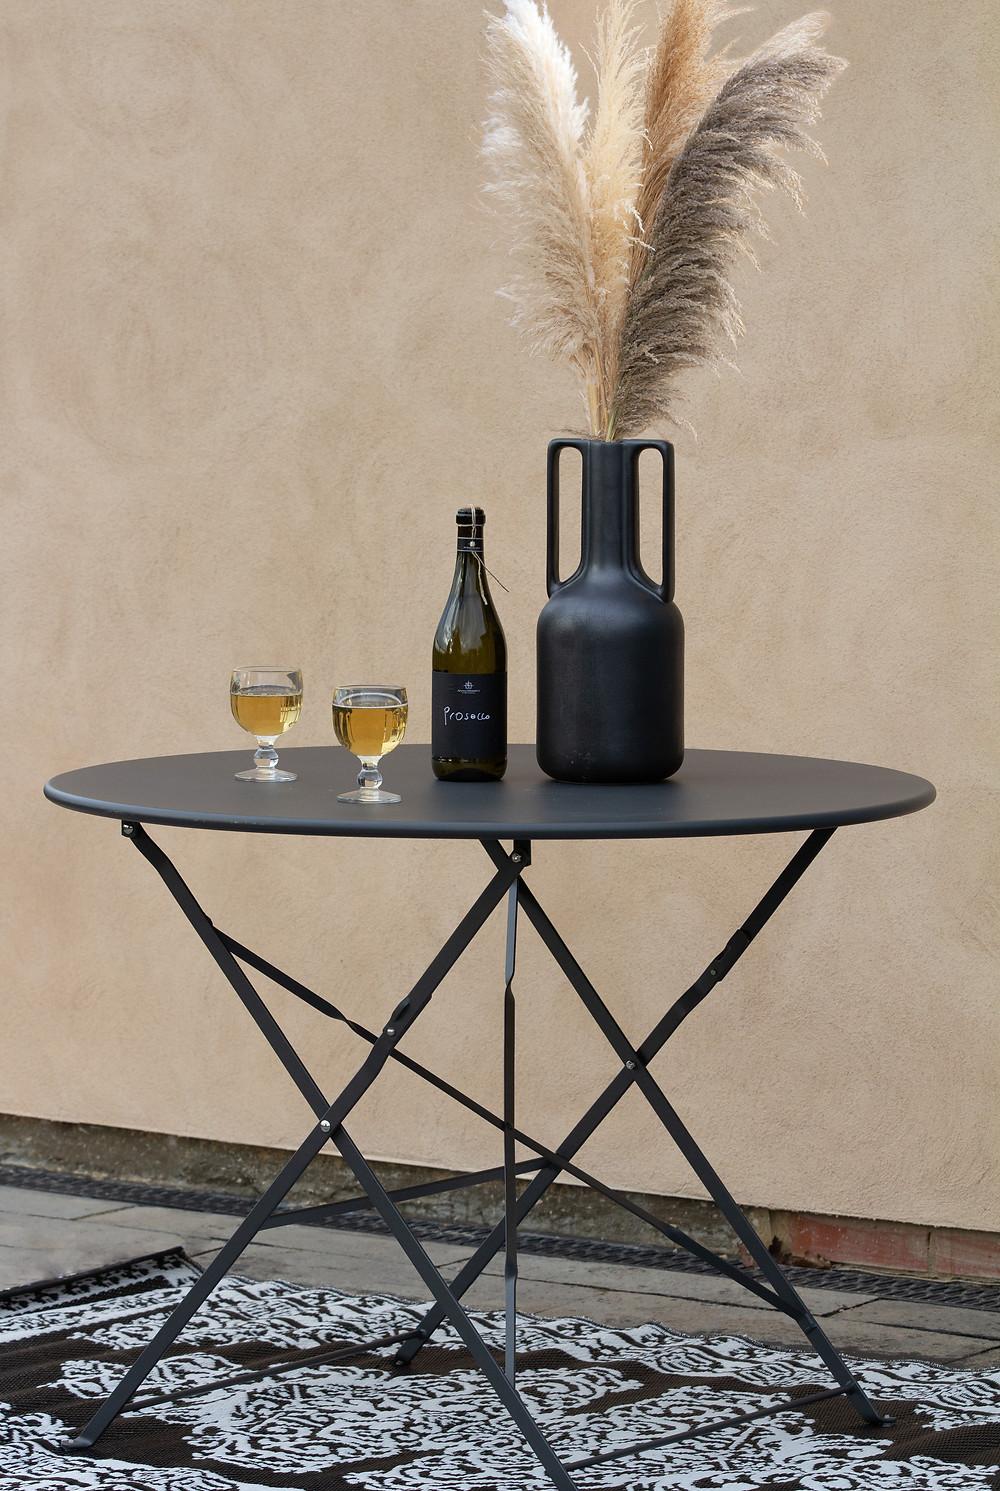 Style and Form Interior Design Blog - Outdoor Garden Tables